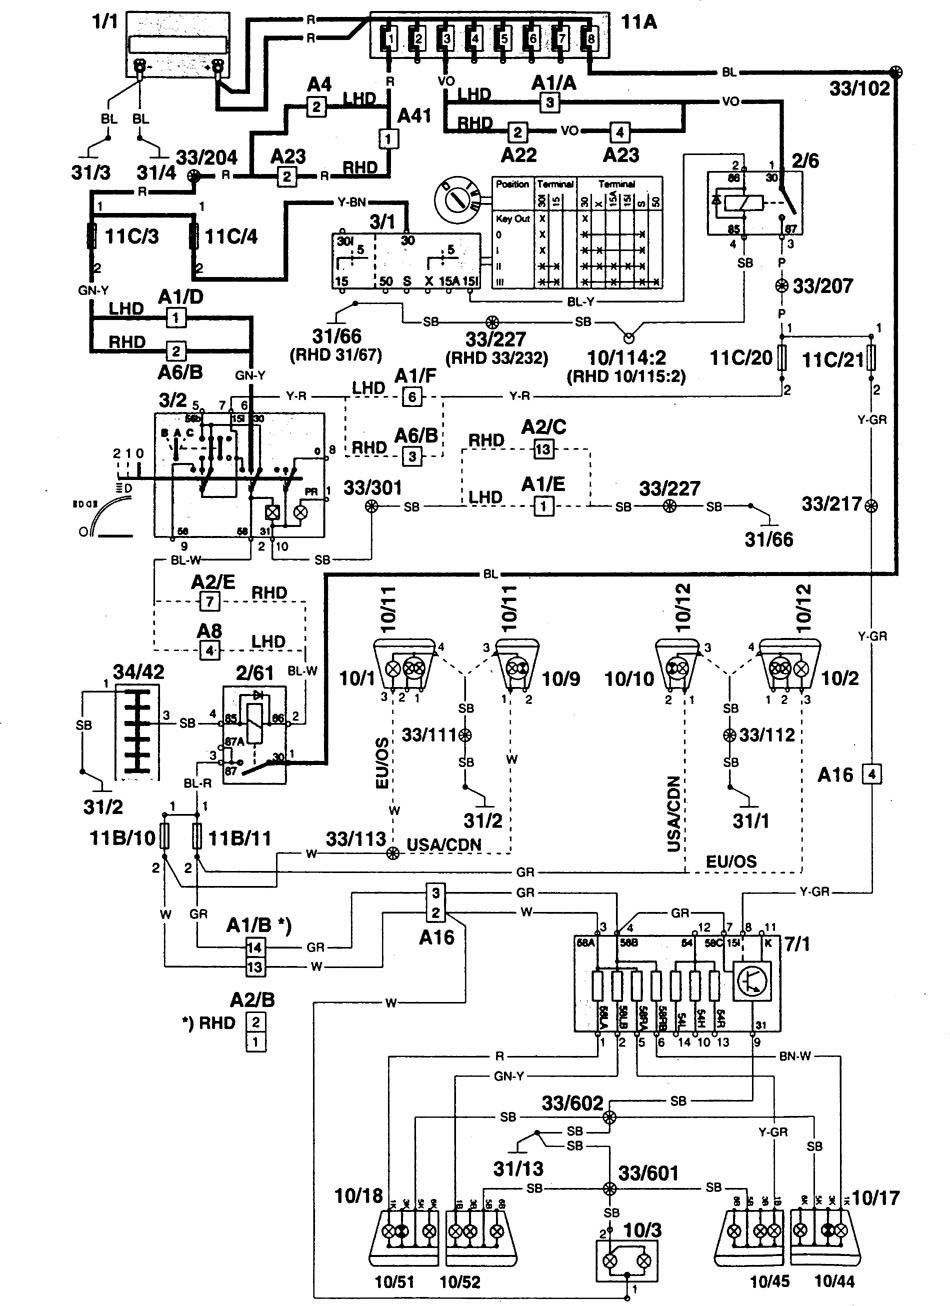 Volvo 960 1995 wiring diagrams license plate l carknowledge 1997 volvo 960 wiring diagram